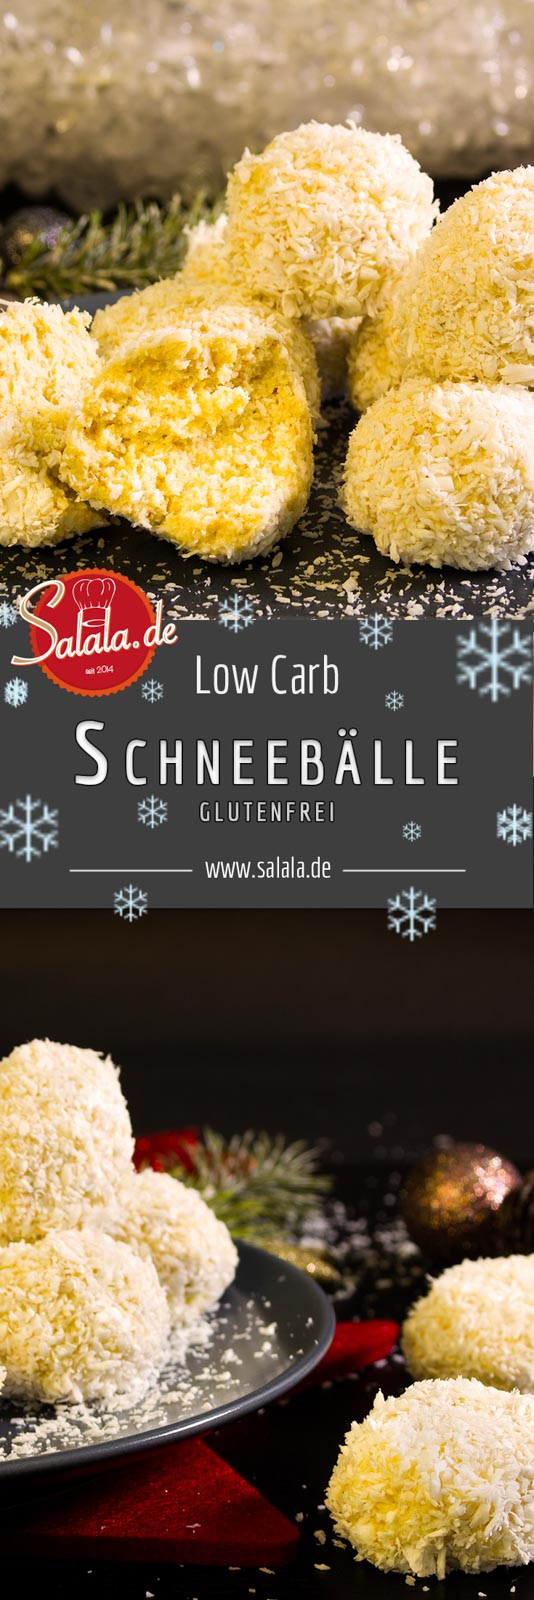 Schneebaelle Low Carb backen Rezept Weihnachtsbäckerei salala.de